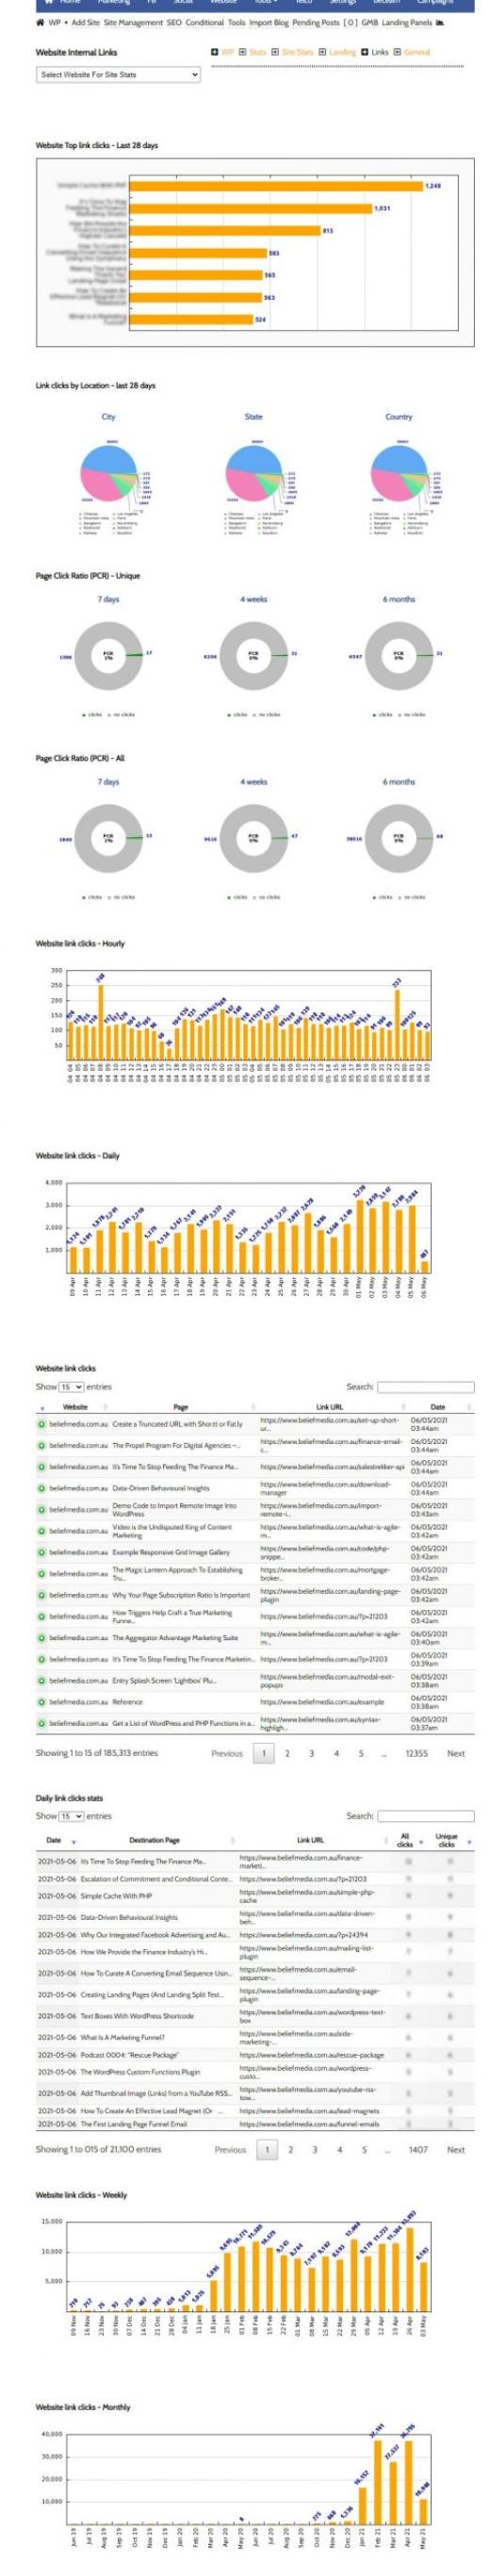 Website Link Statistics